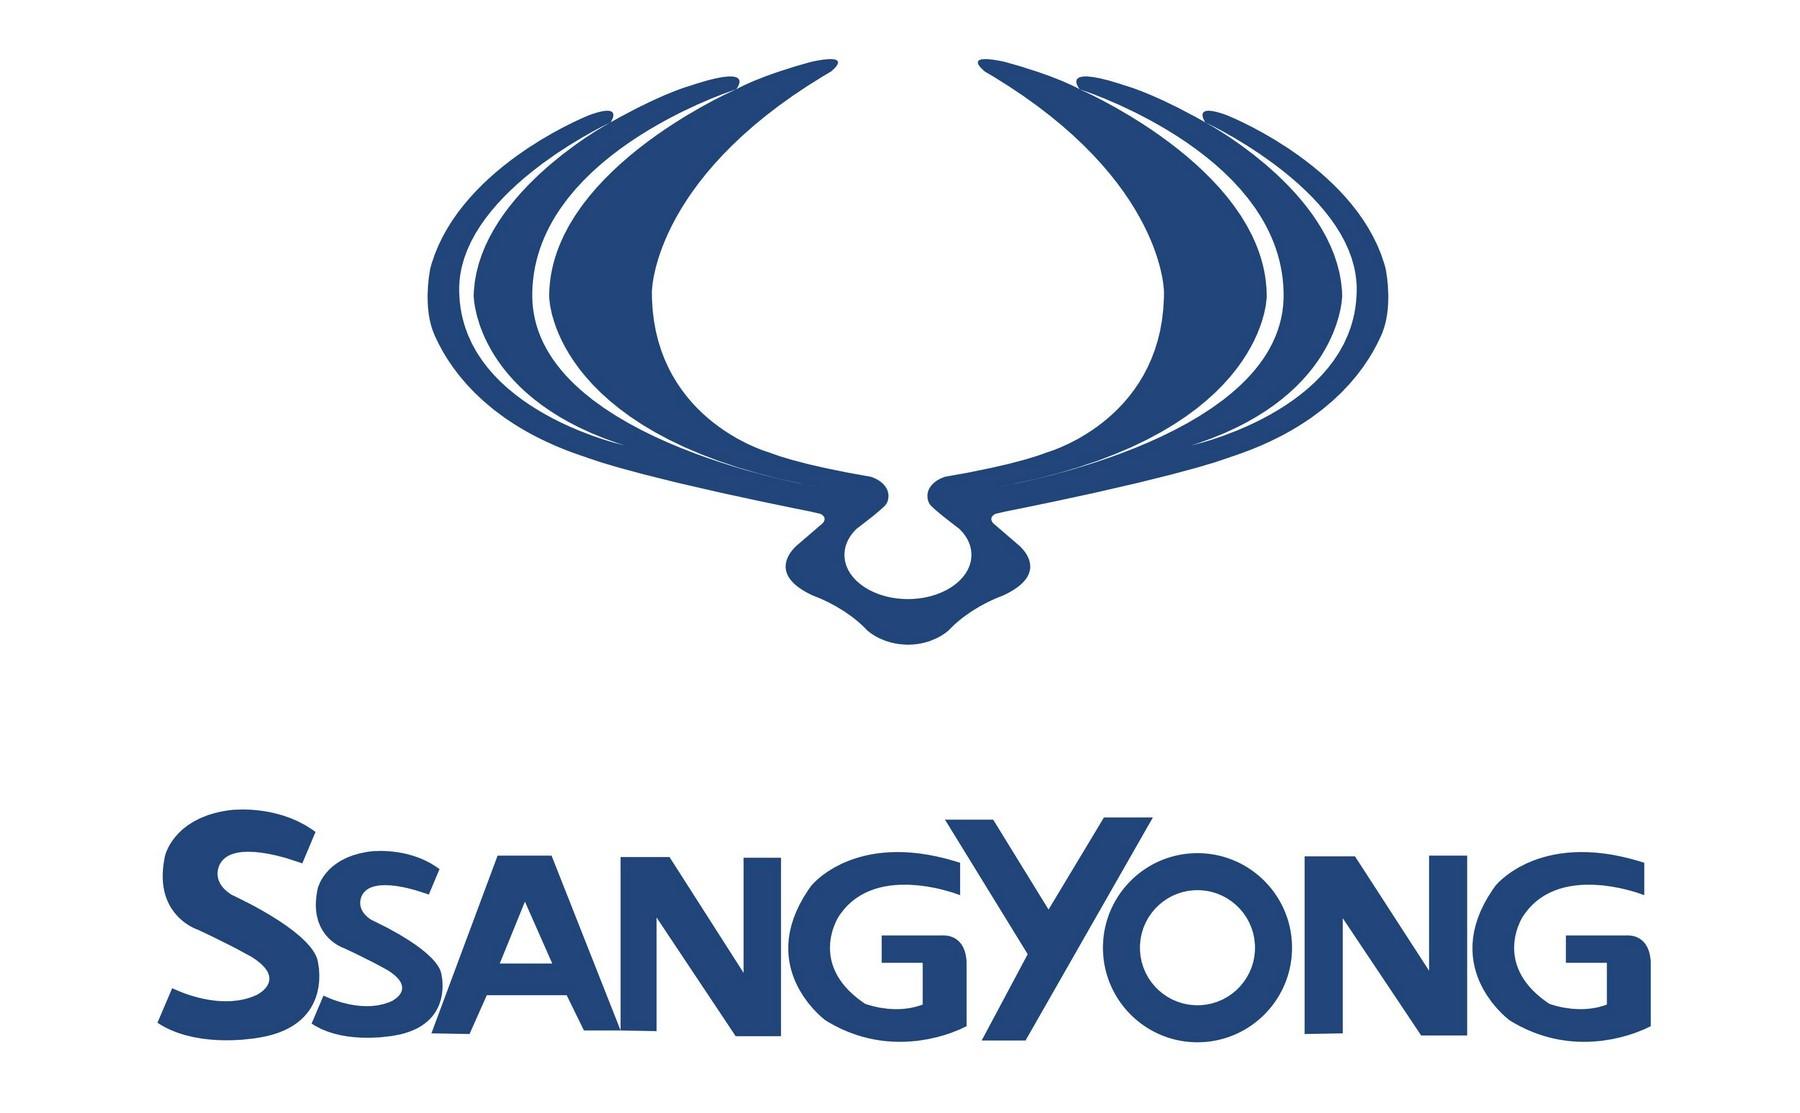 Photo of SsangYong Kasım 2015 Fiyat Listesi